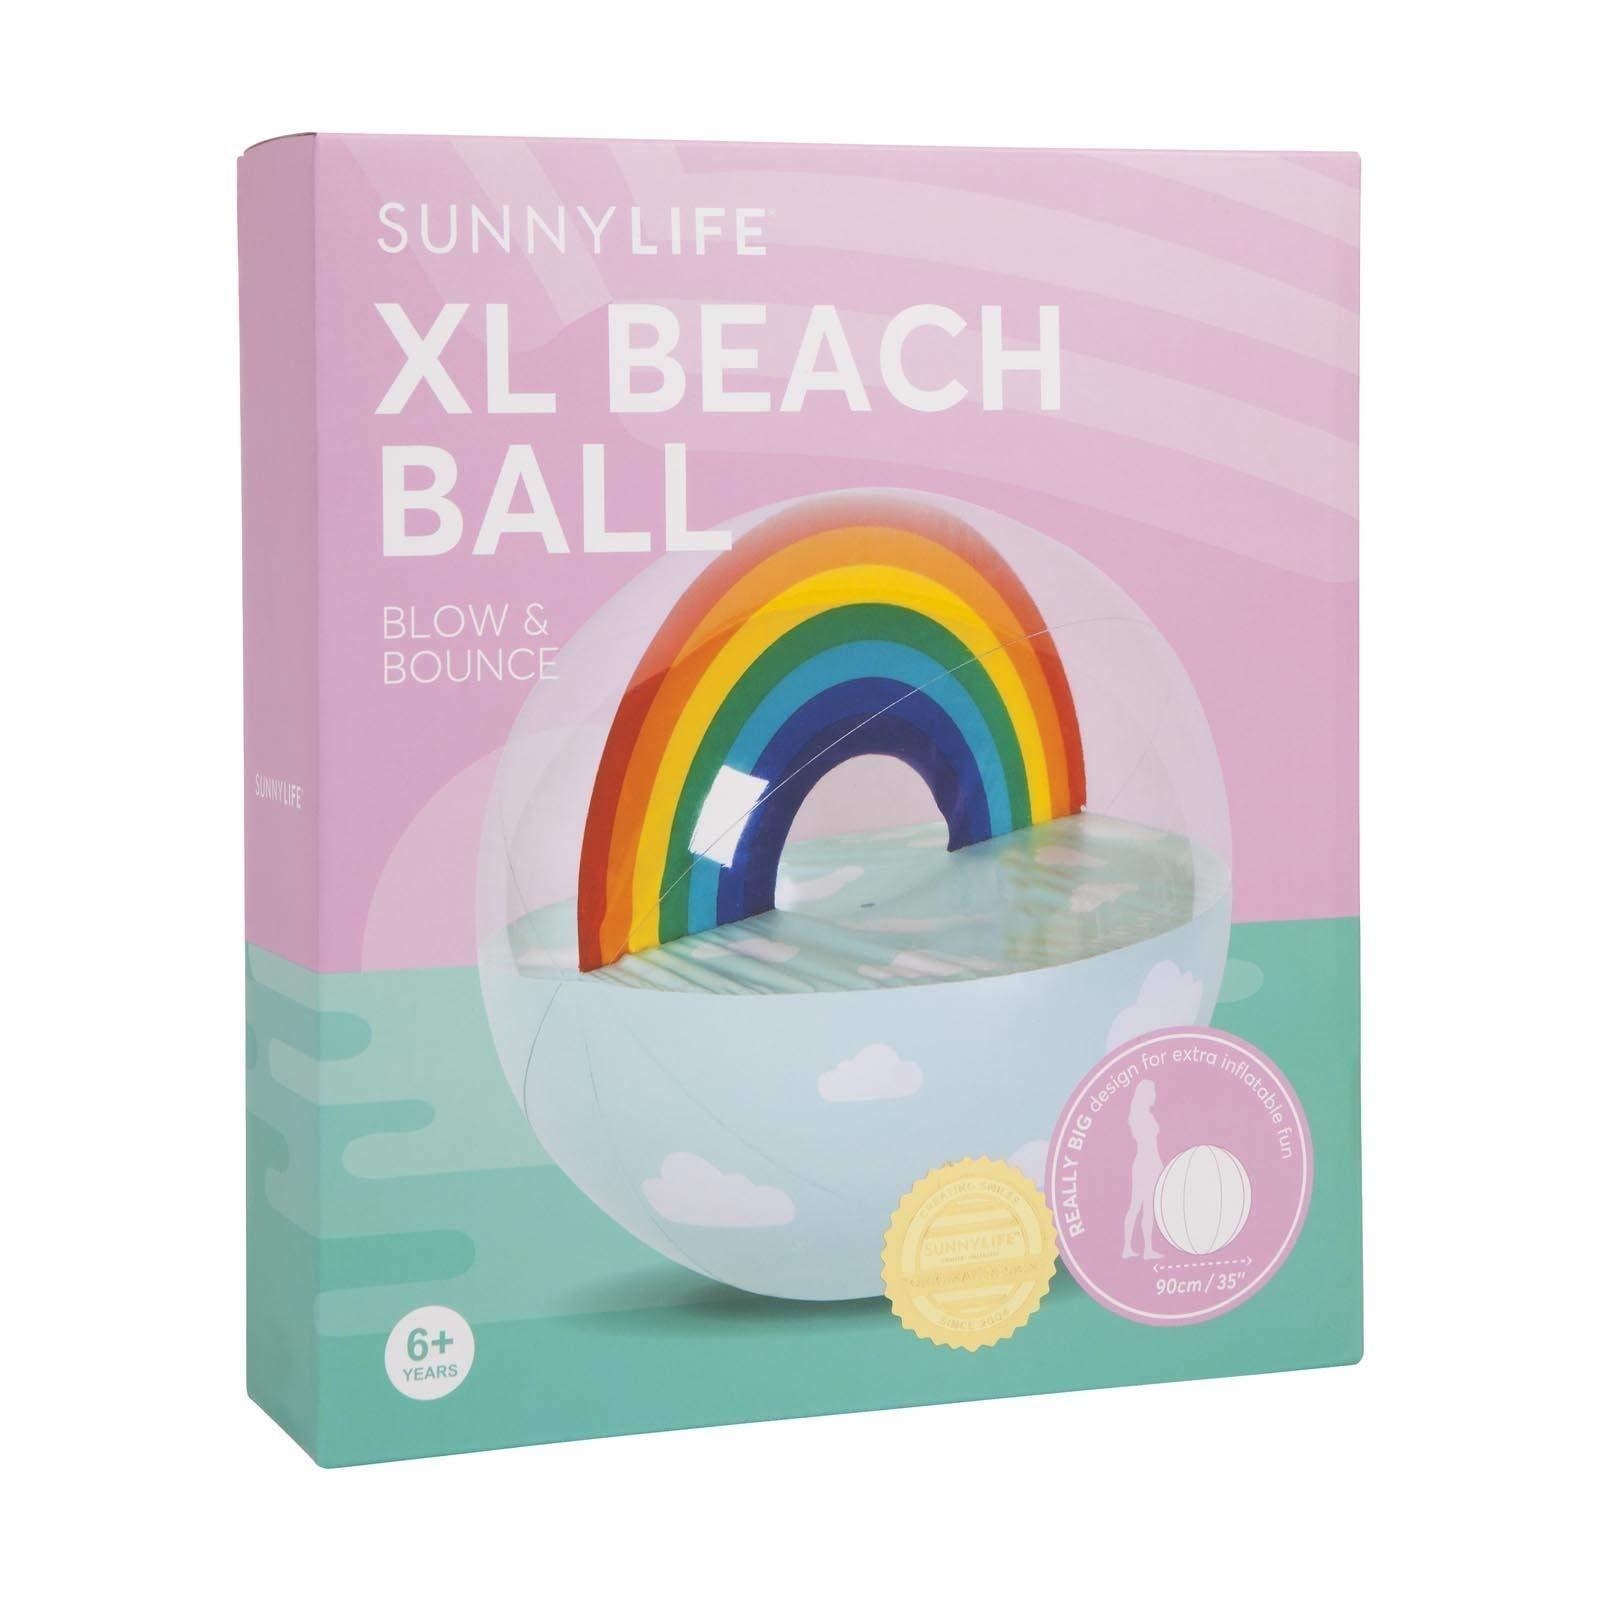 SunnyLIFE Classic Large Inflatable Round Beach Ball Summer Pool Toy - Rainbow Multi